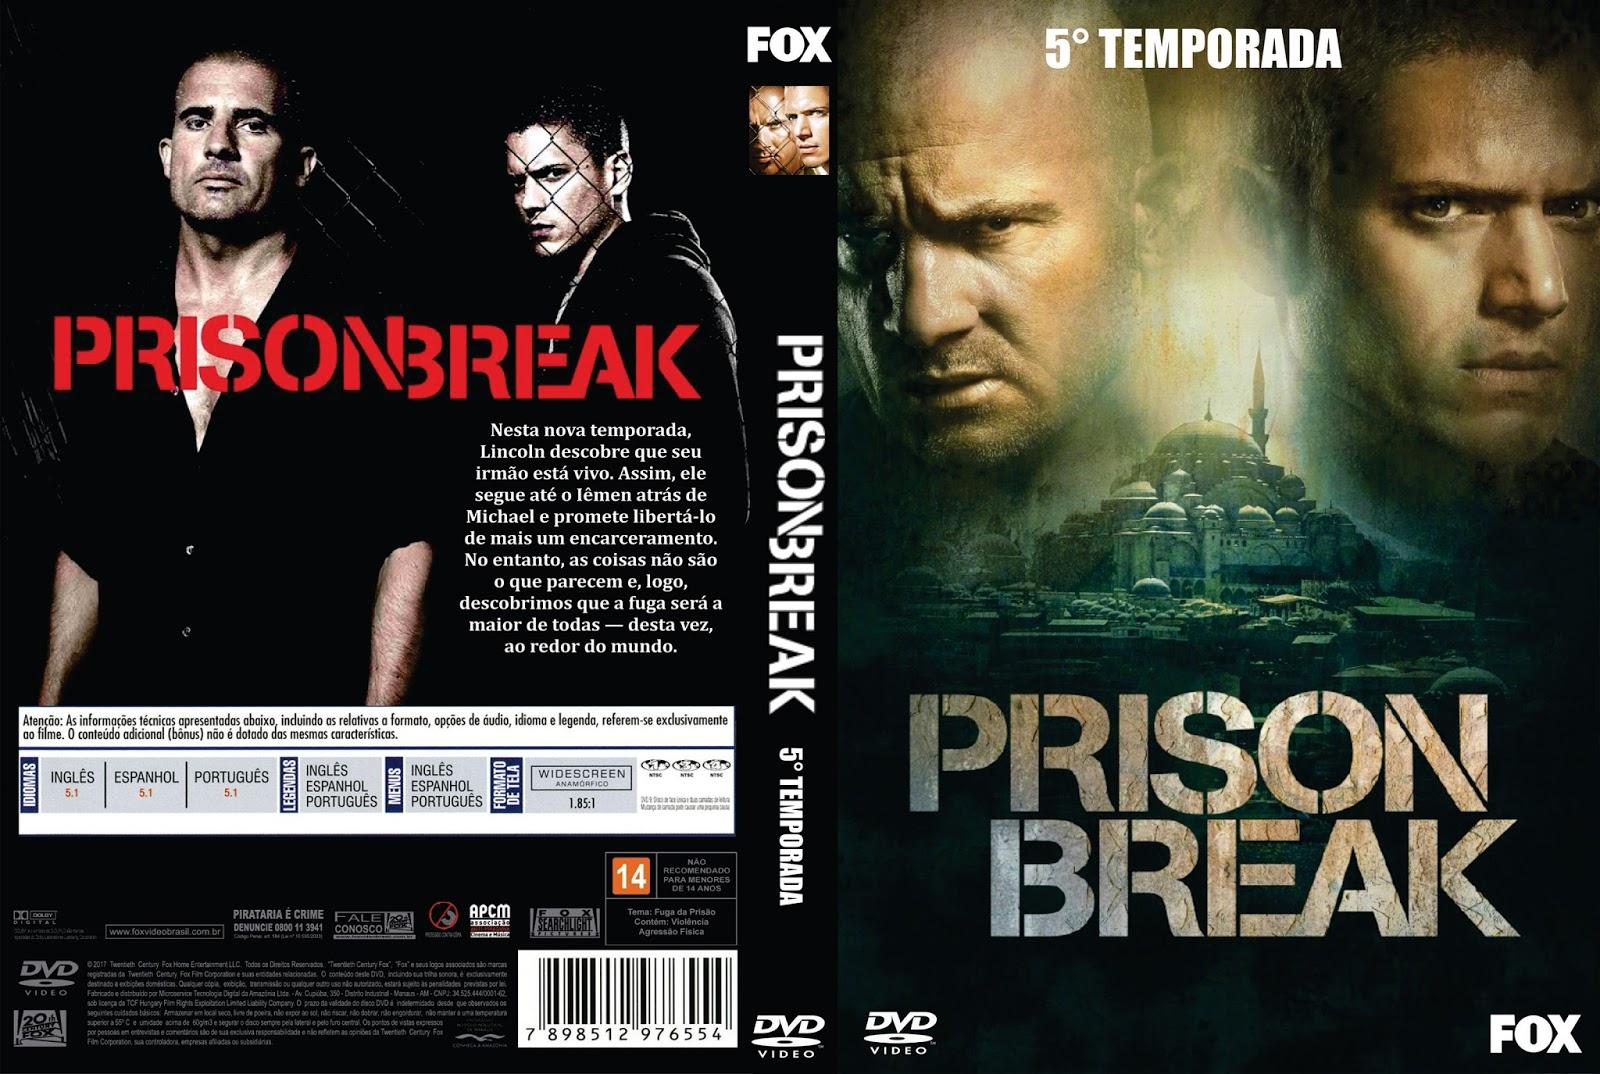 Download prison break 4 temporada. KENNEDYHENCE.GA